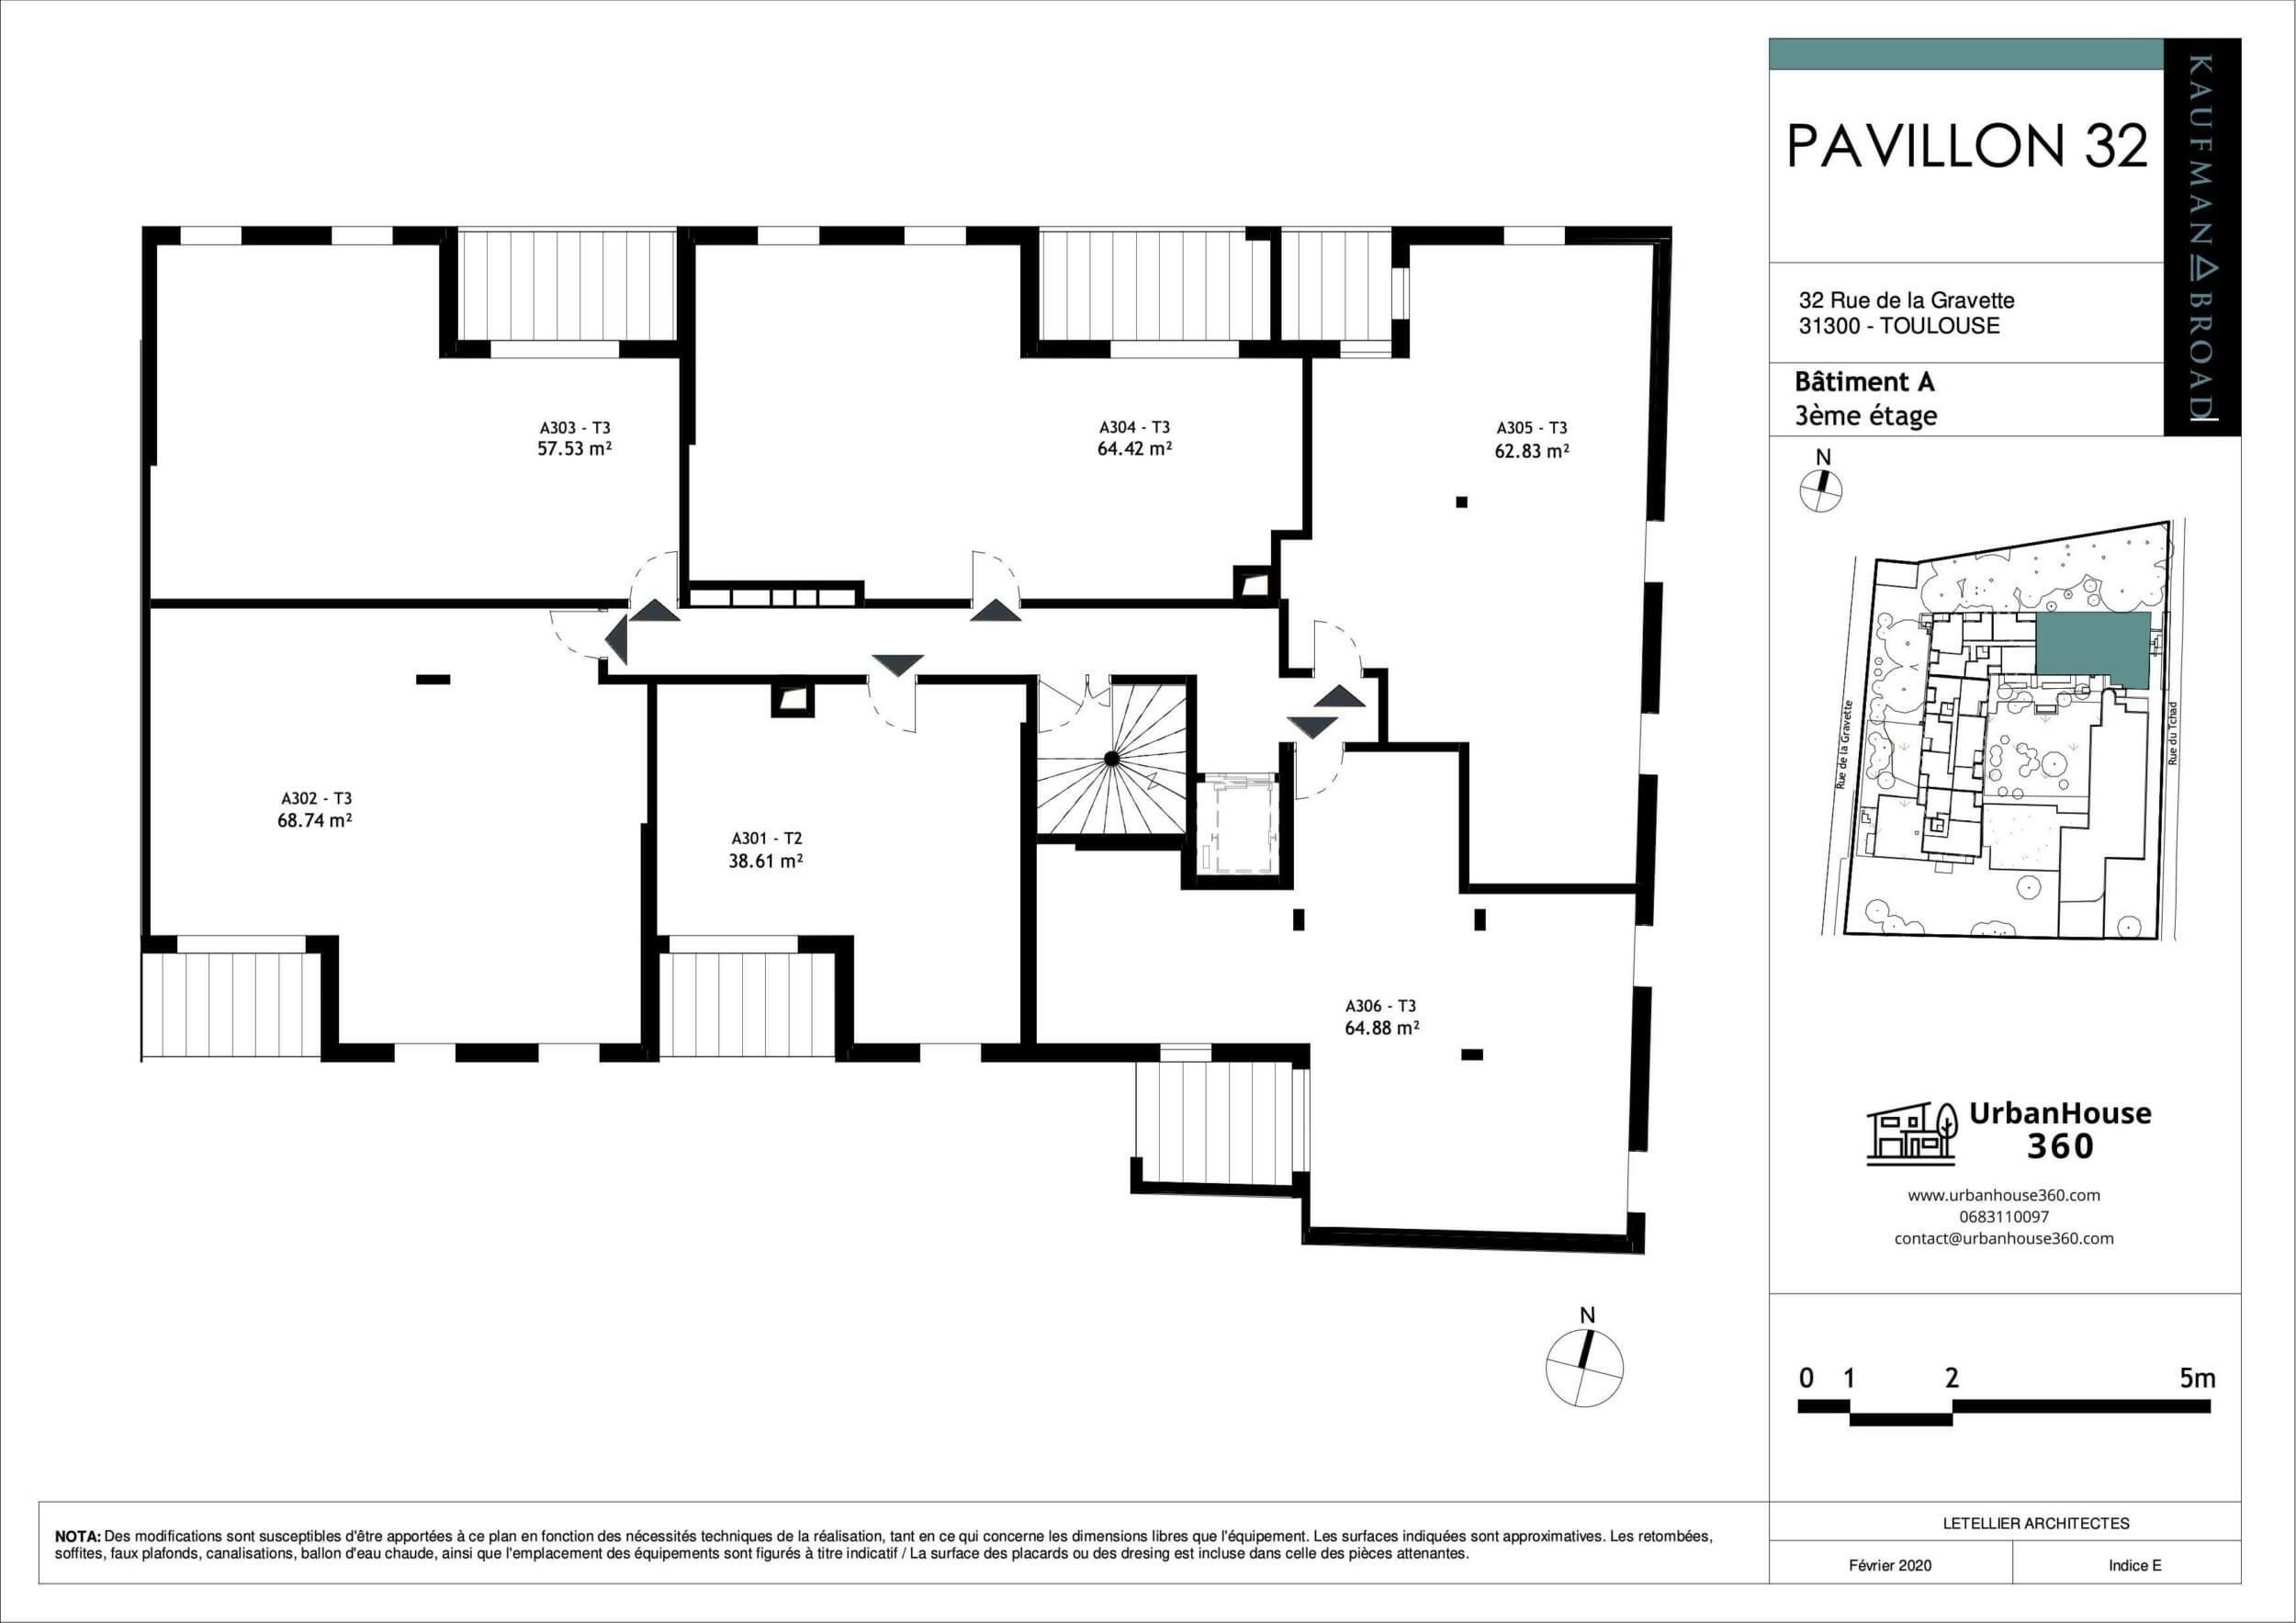 UrbanHouse360-Pavillon32-A_R+3_ind E